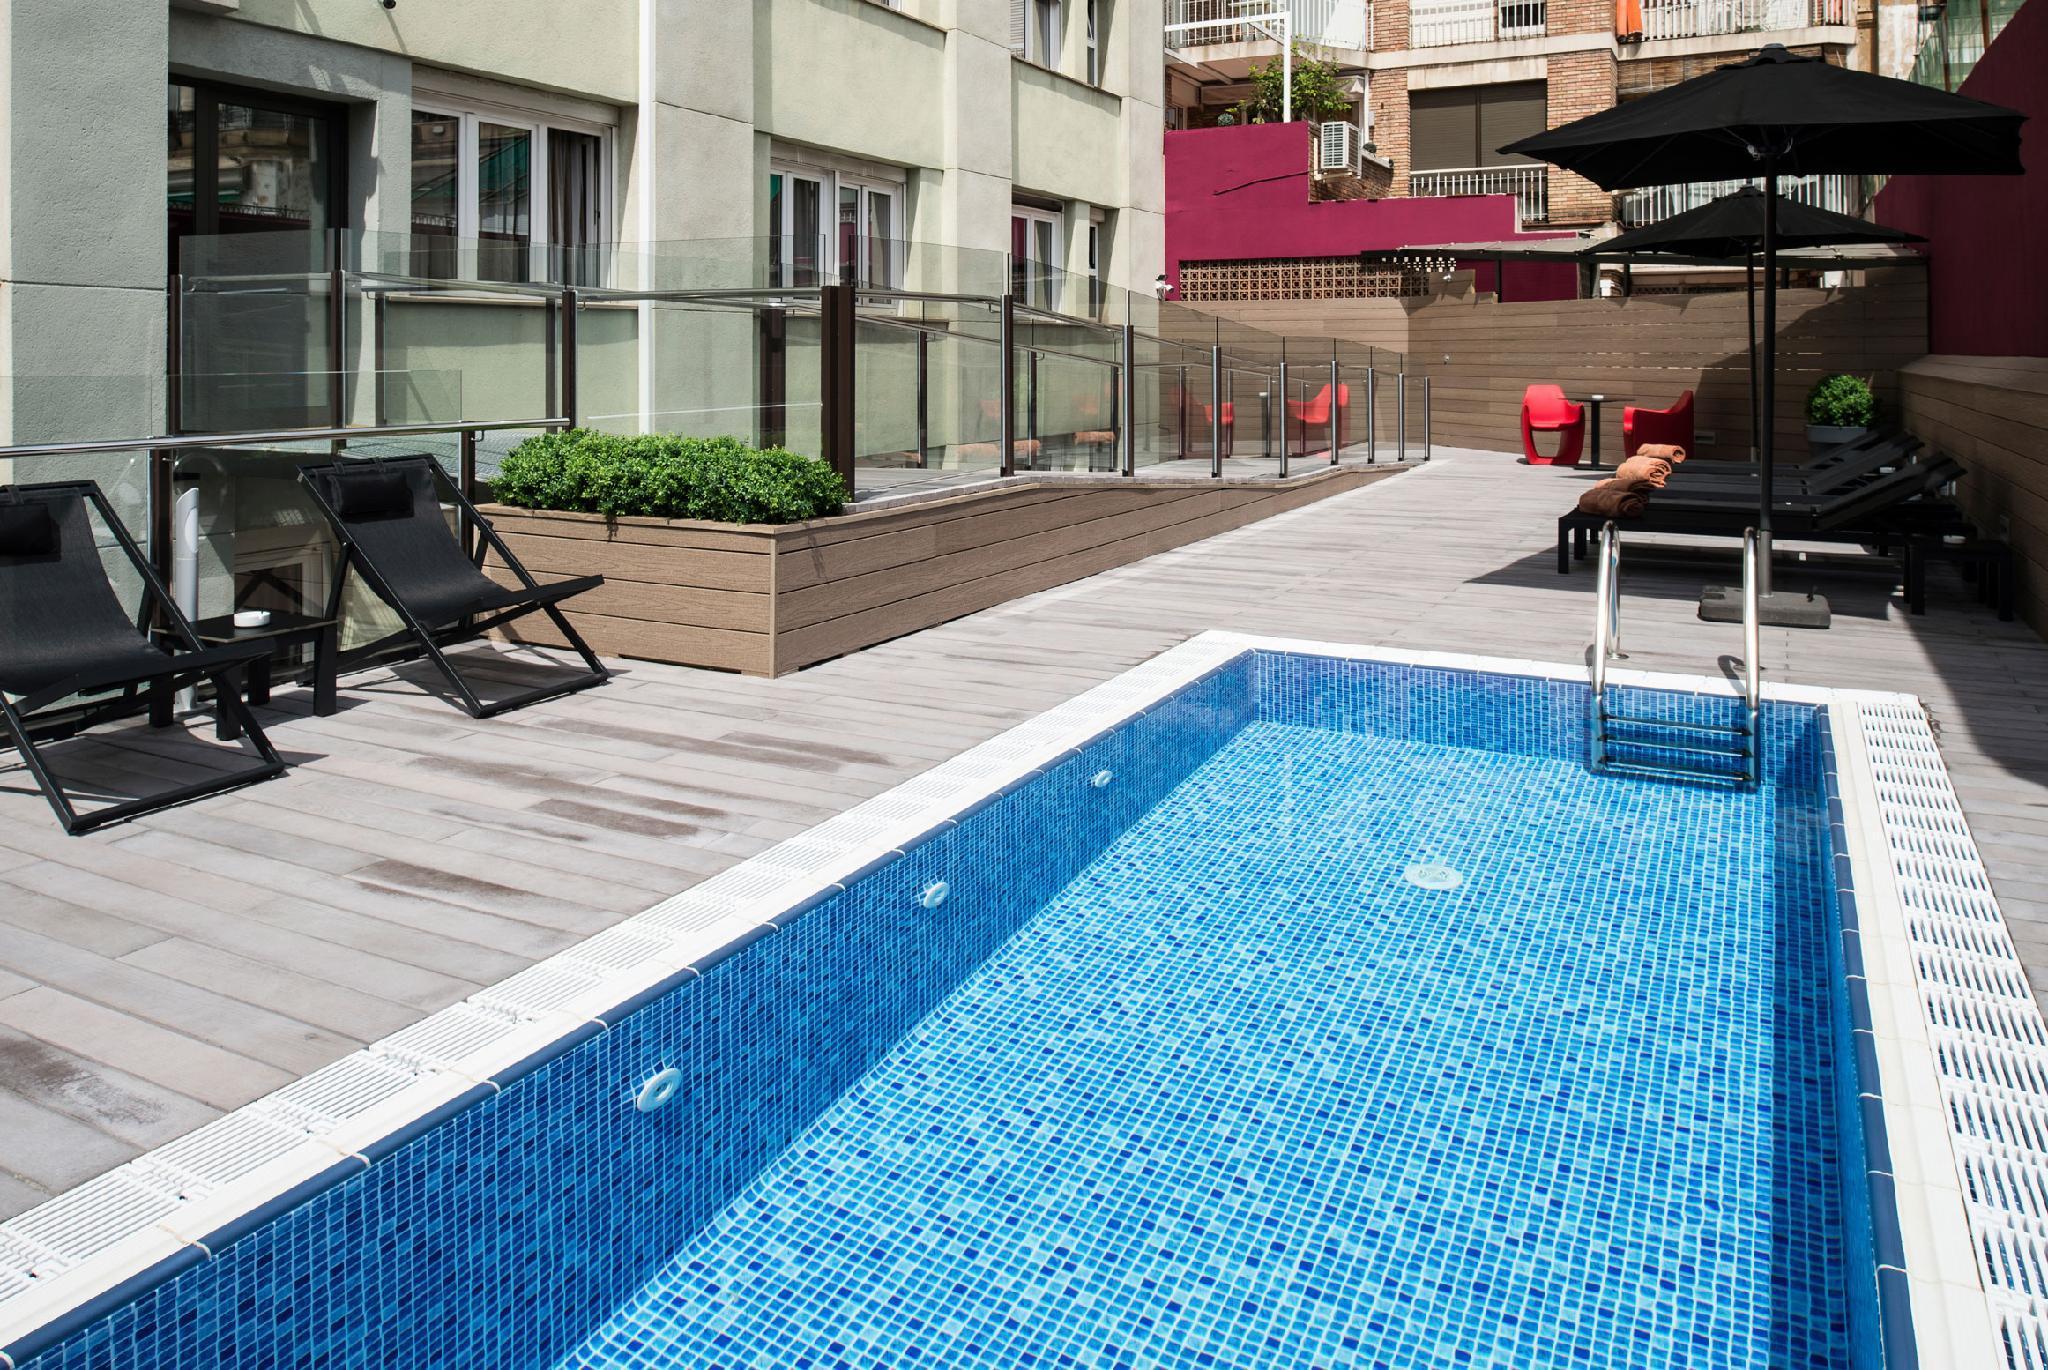 Catalonia Diagonal Centro Hotel